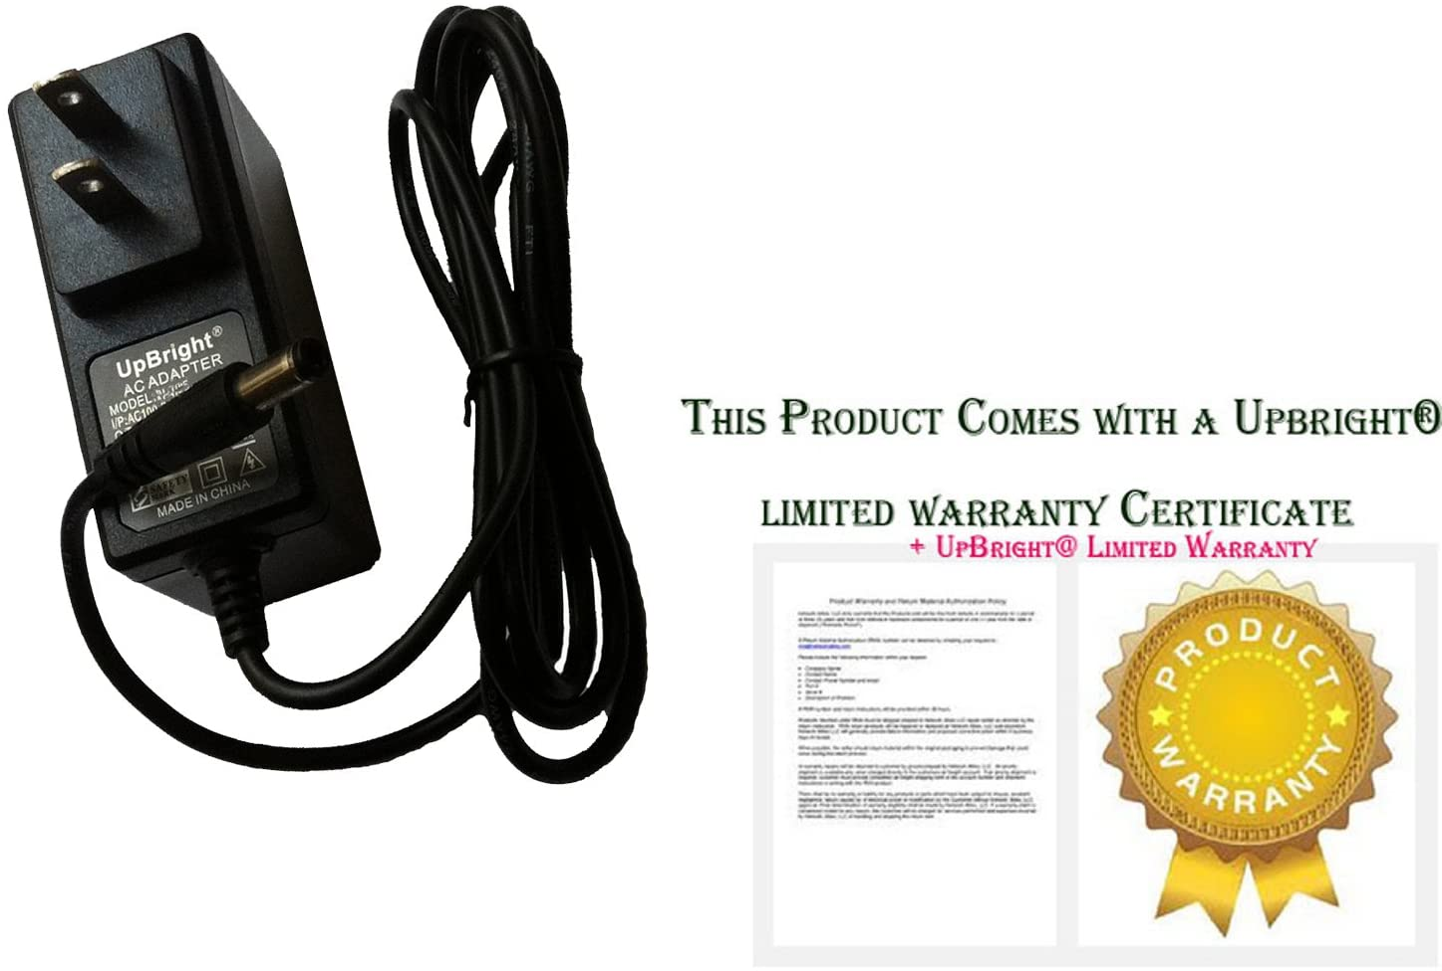 UPBRIGHT New Global 12V AC/DC Adapter for Braun Silk Epil Lady Shaver Epilator Smart 3980 3990 5180 5185 5270 5275 5280 5285 5316 5317 5318 5319 5370 5375 5380 12VDC Power Supply Battery Charger